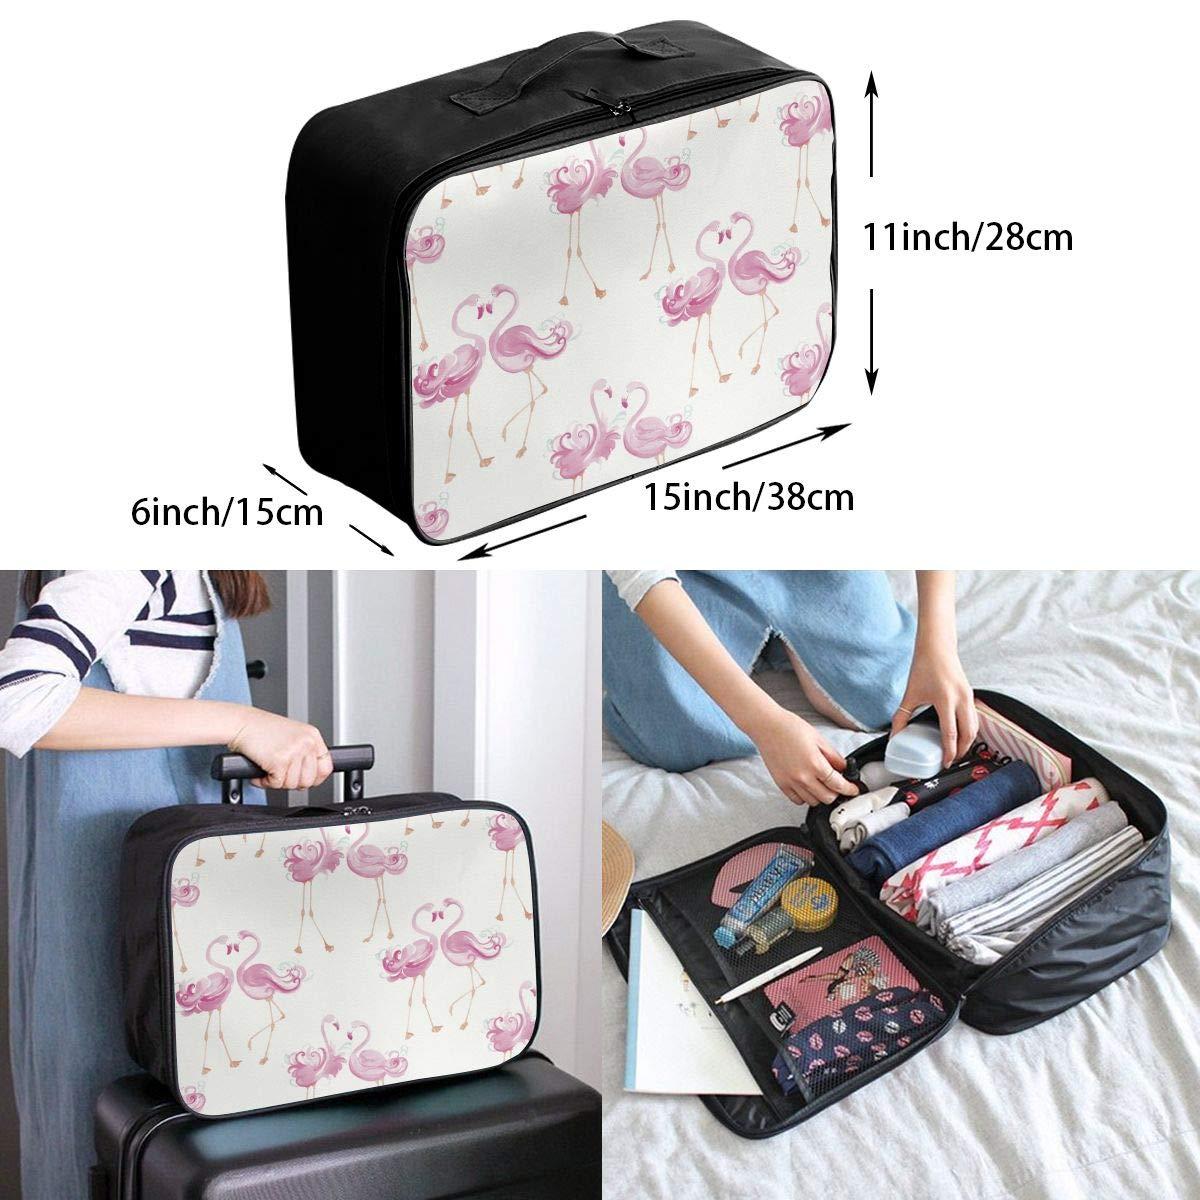 Travel Luggage Duffle Bag Lightweight Portable Handbag Flamingo Print Large Capacity Waterproof Foldable Storage Tote